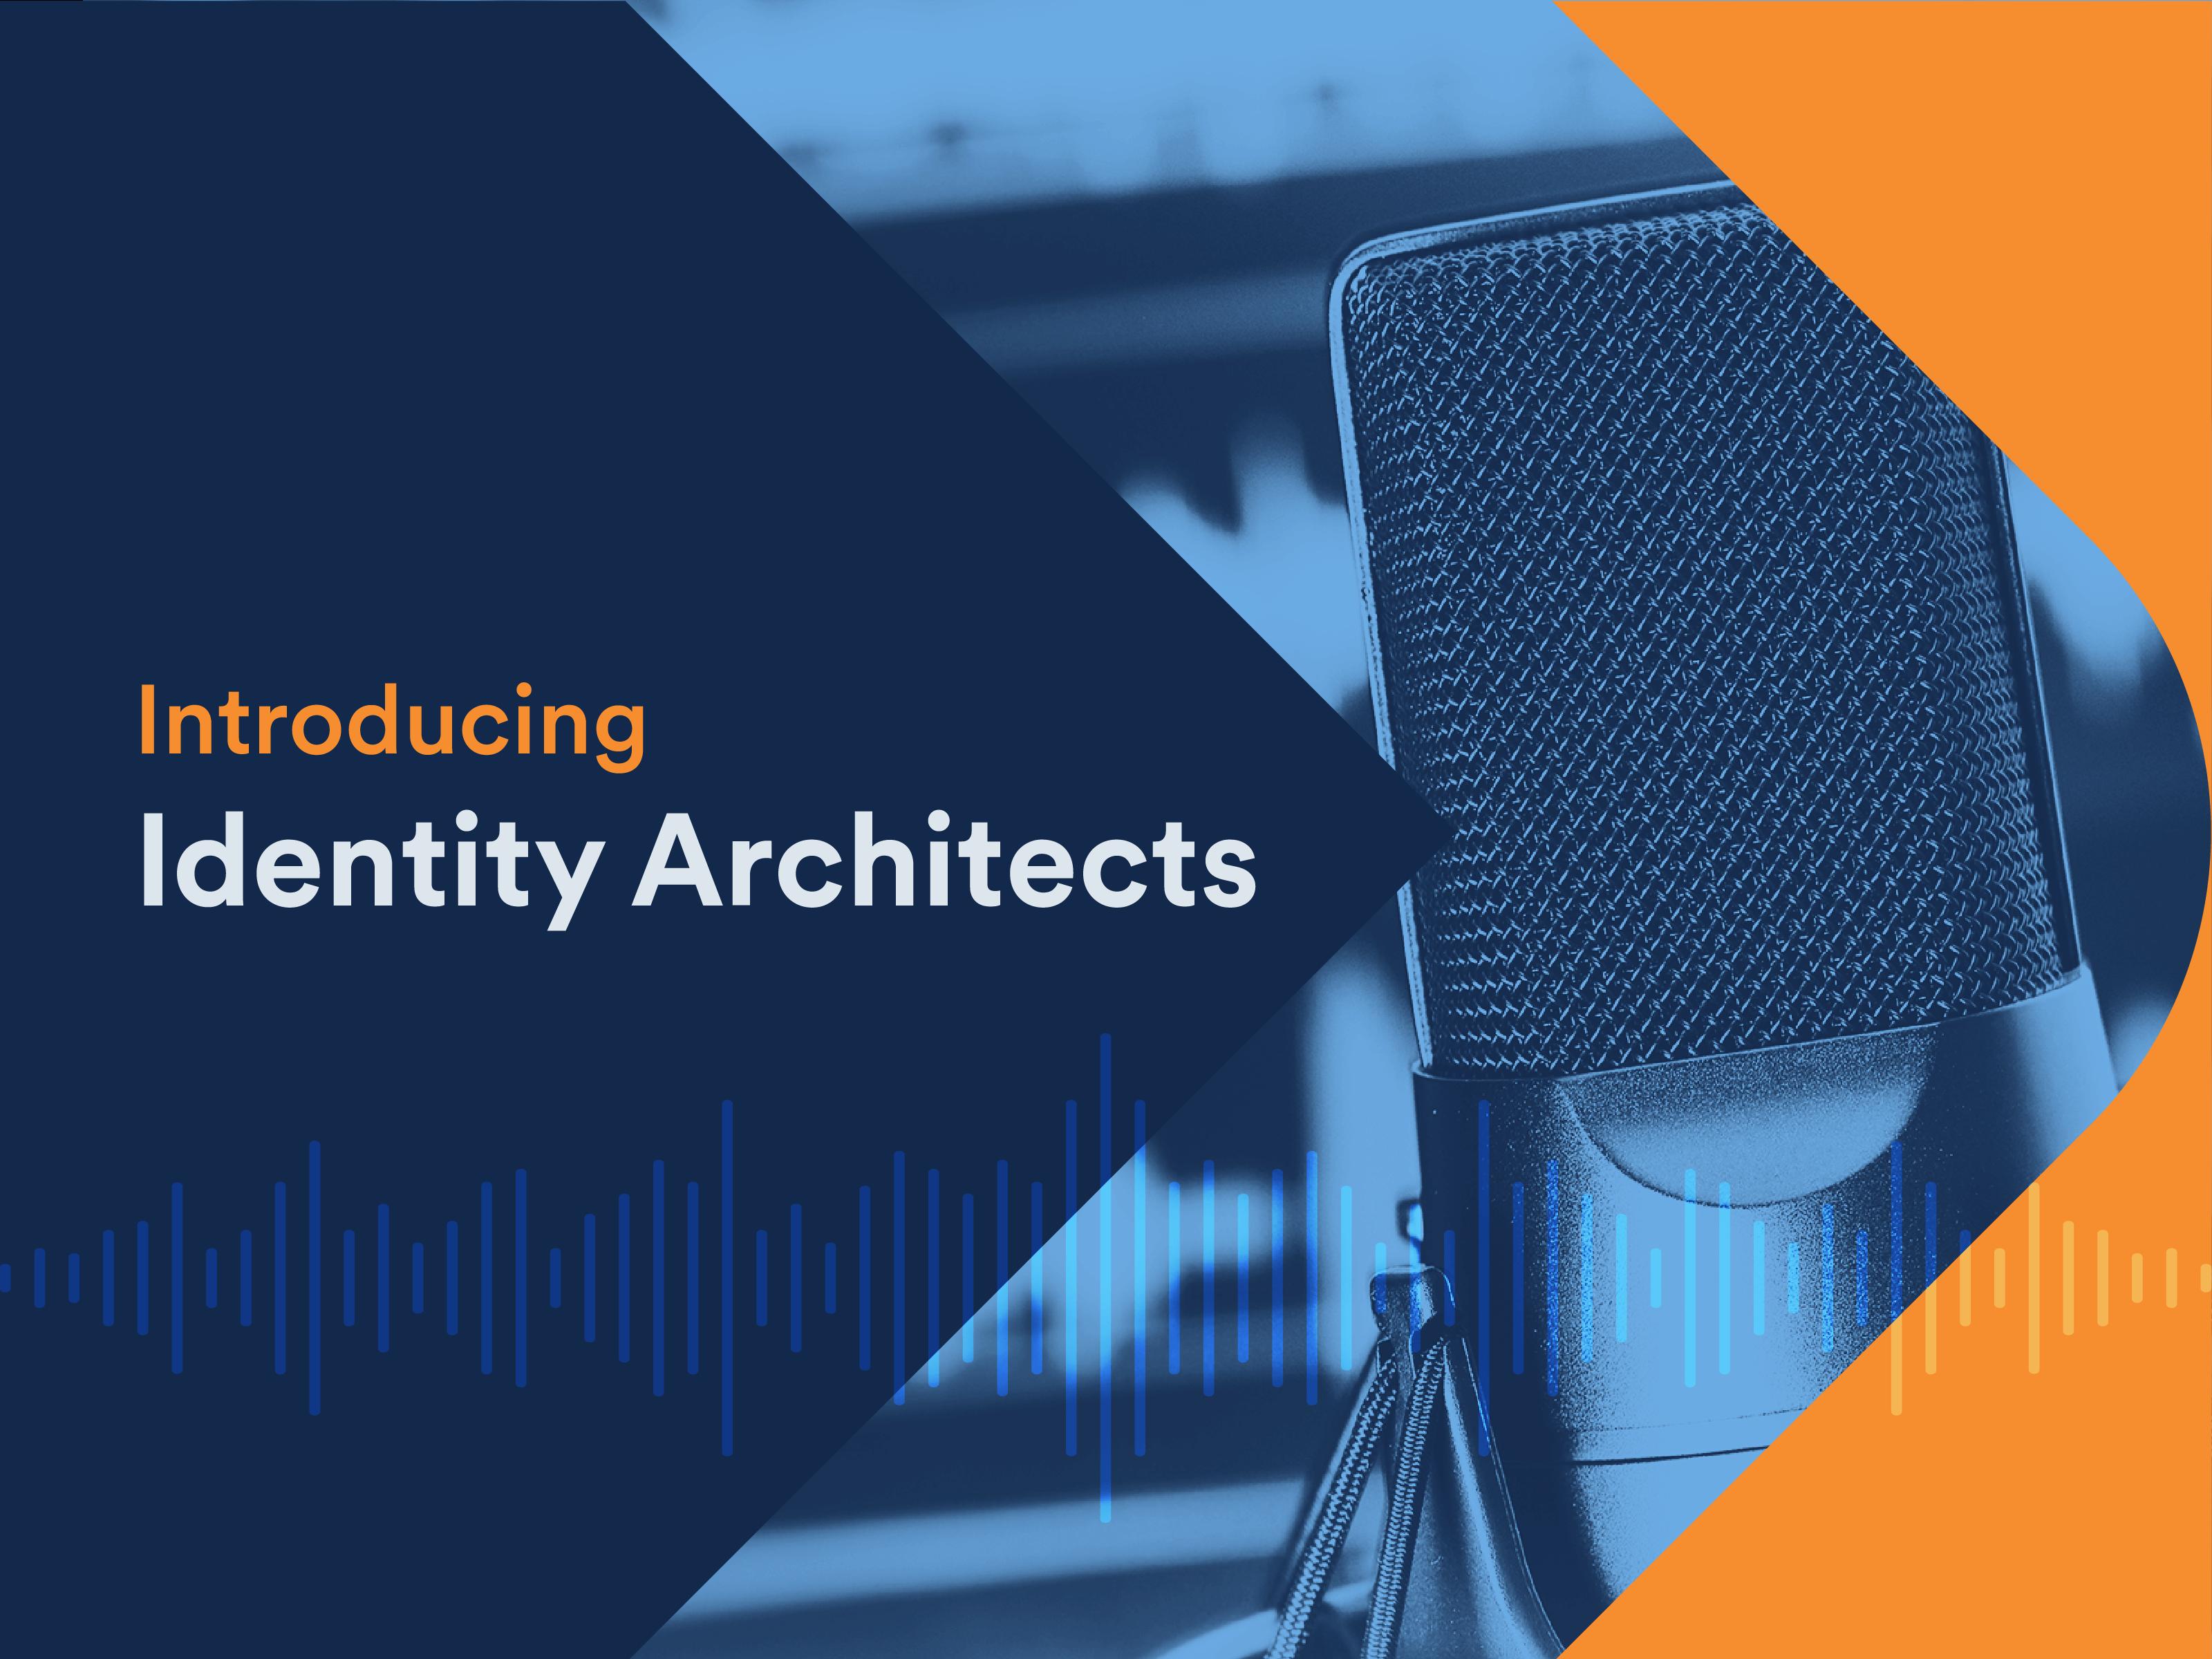 Introducing Identity Architects